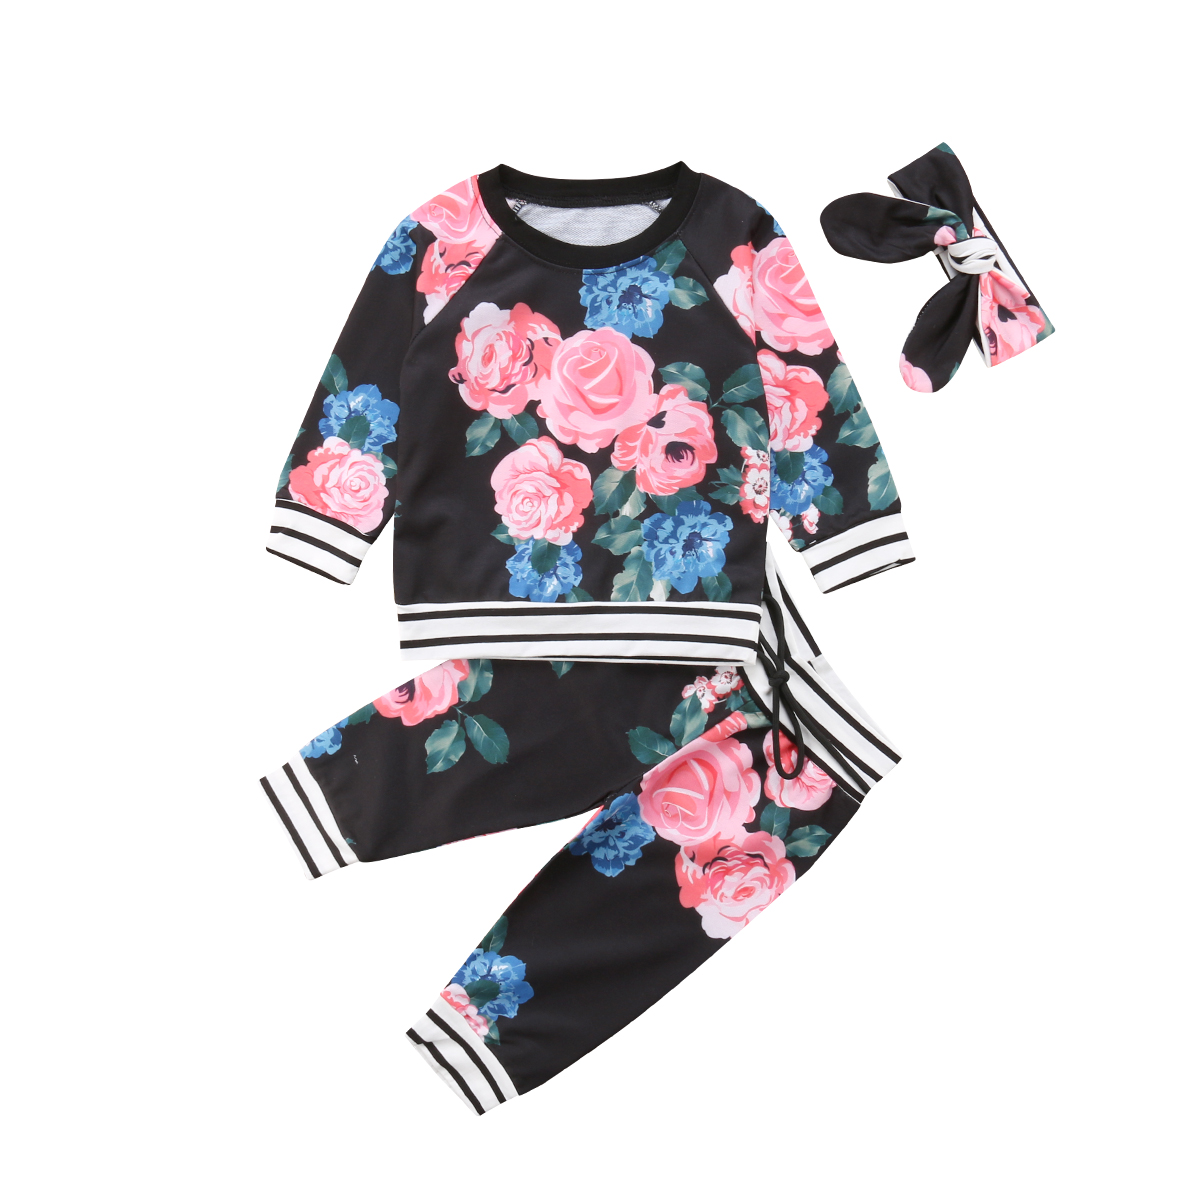 3pcs Newborn Baby Girl Floral Clothes Set Tops T Shirt Pants Leggings Outfits